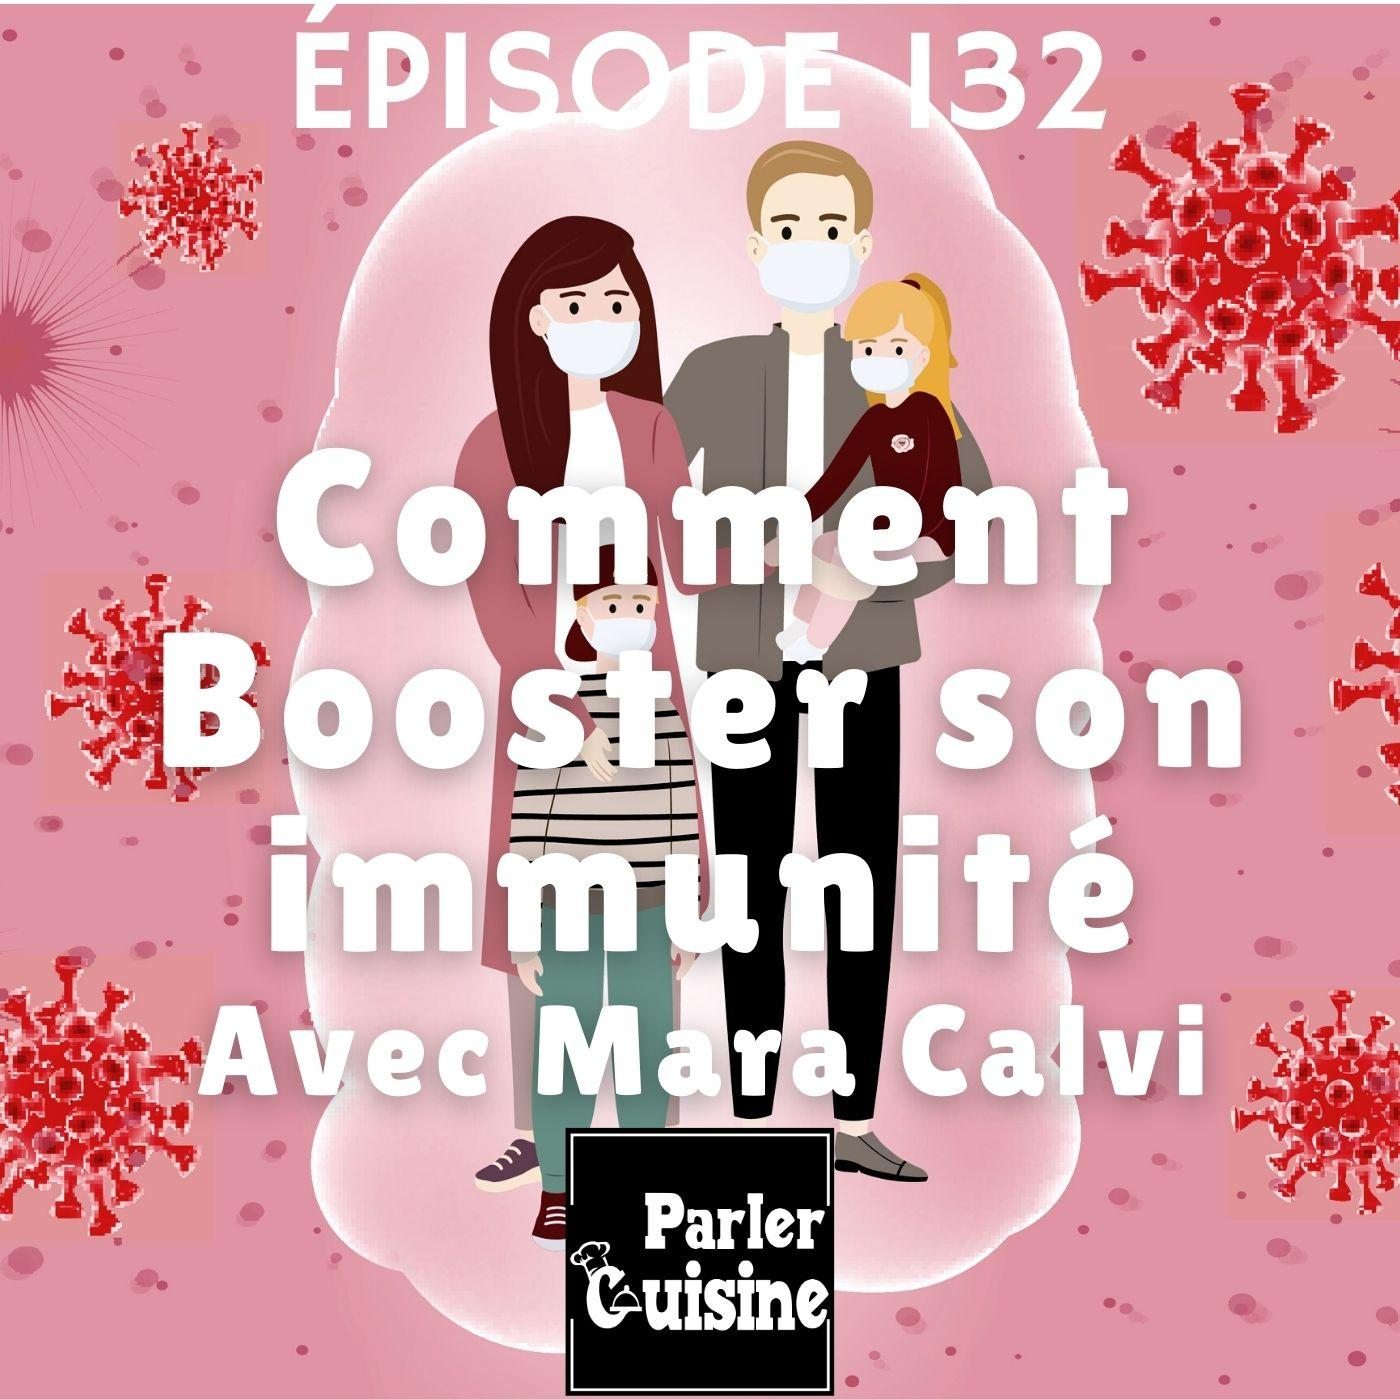 Episode 132 Comment booster son immunité, avec Mara Calvi